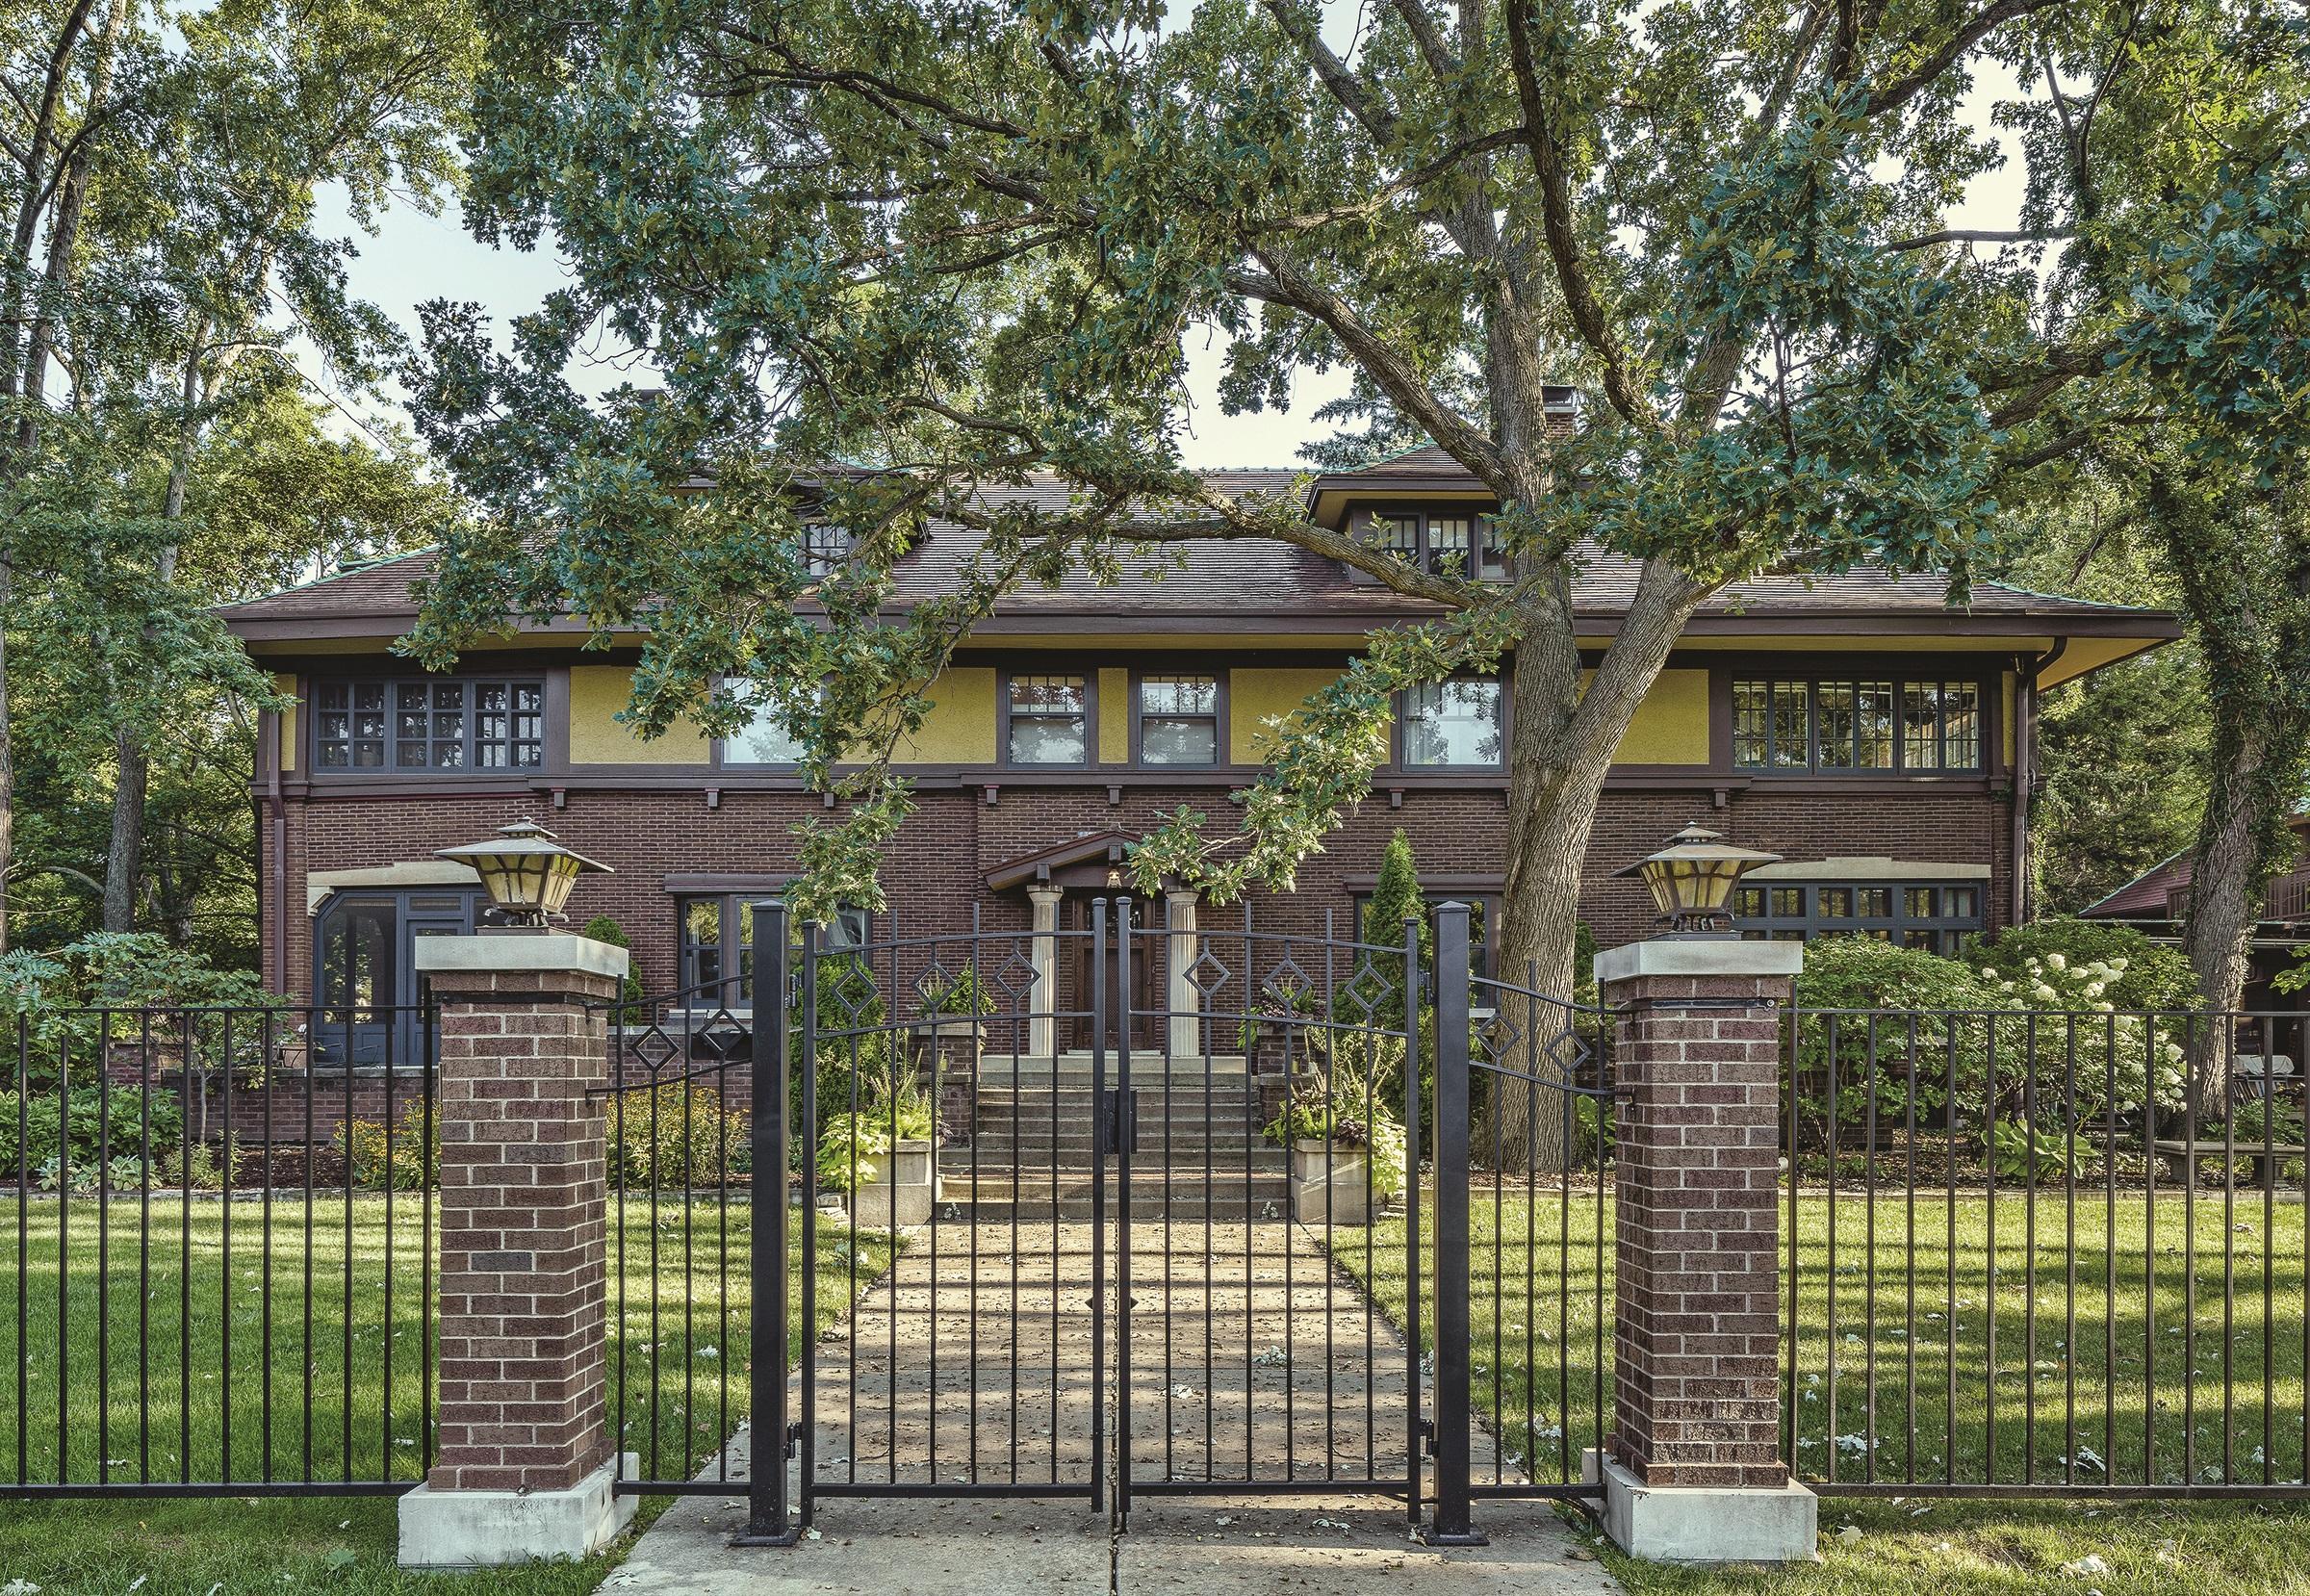 George D. Webb House ( Henry K. Holsman, 1910) Credit: Courtesy of Frank Lloyd Wright Tru st. Photographer: James Caulfield